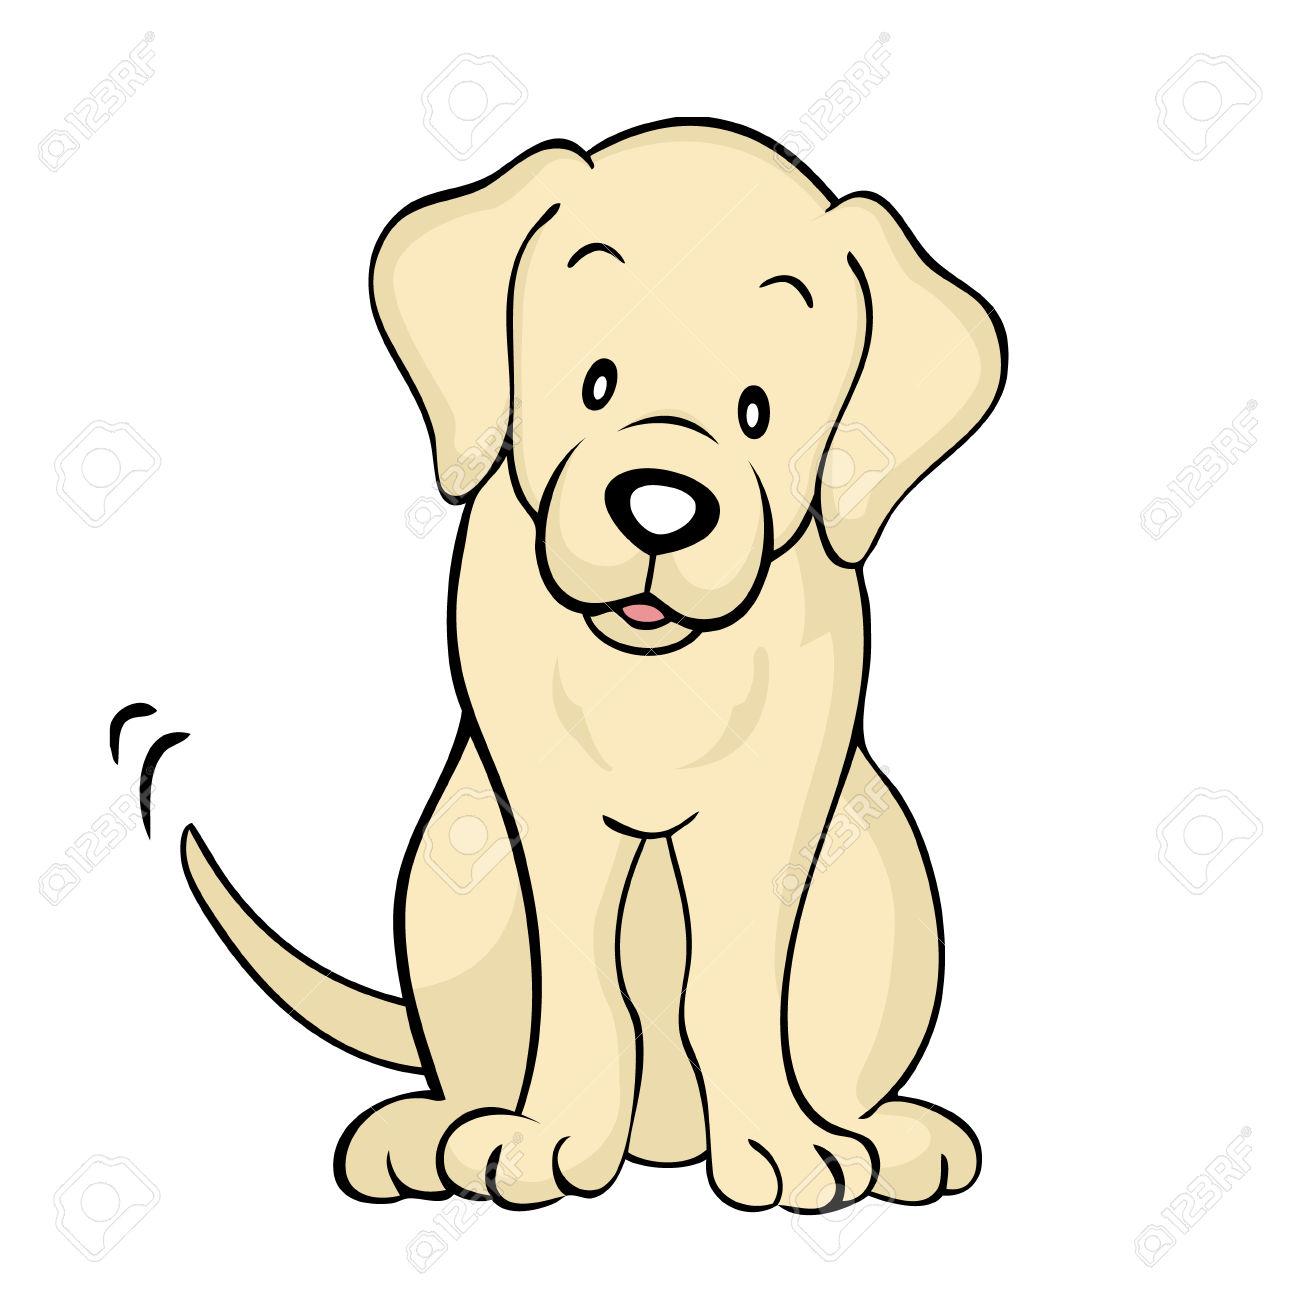 1300x1300 Clipart Puppy Sad Eyes Dog Puppy Clip Art 3033696